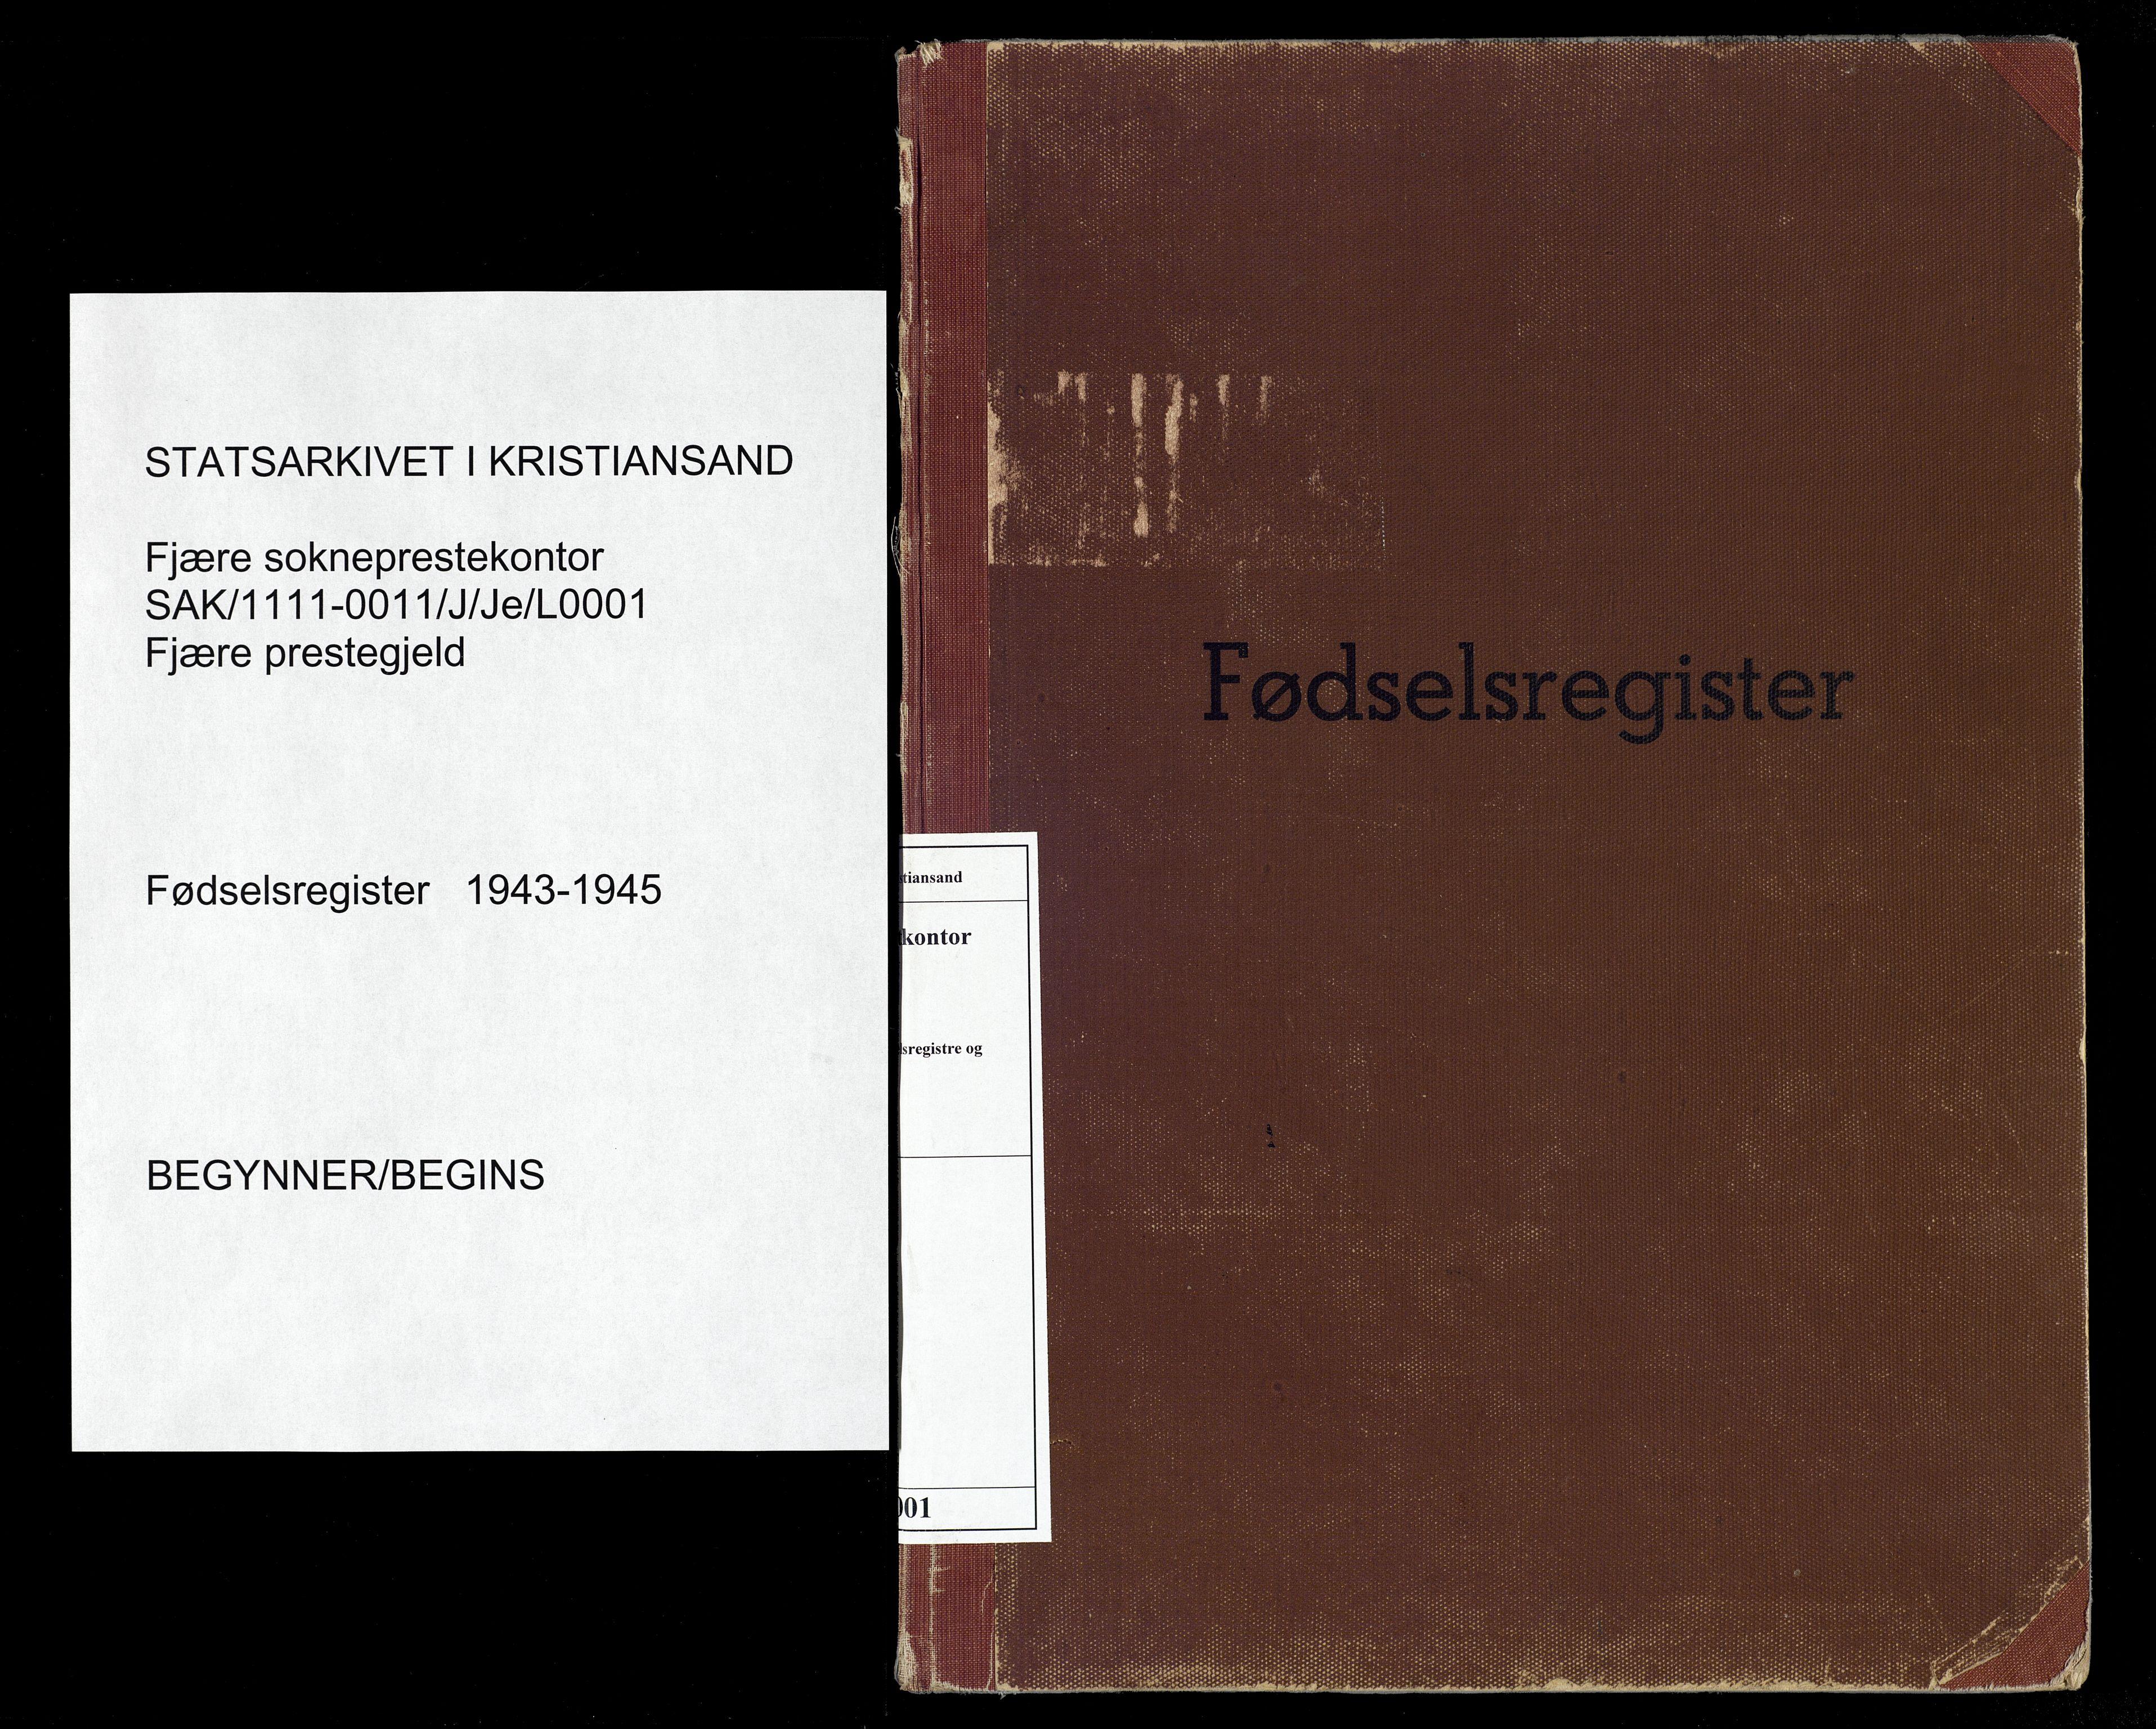 SAK, Fjære sokneprestkontor, J/Je/L0001: Fødselsregister nr. 1, 1943-1945